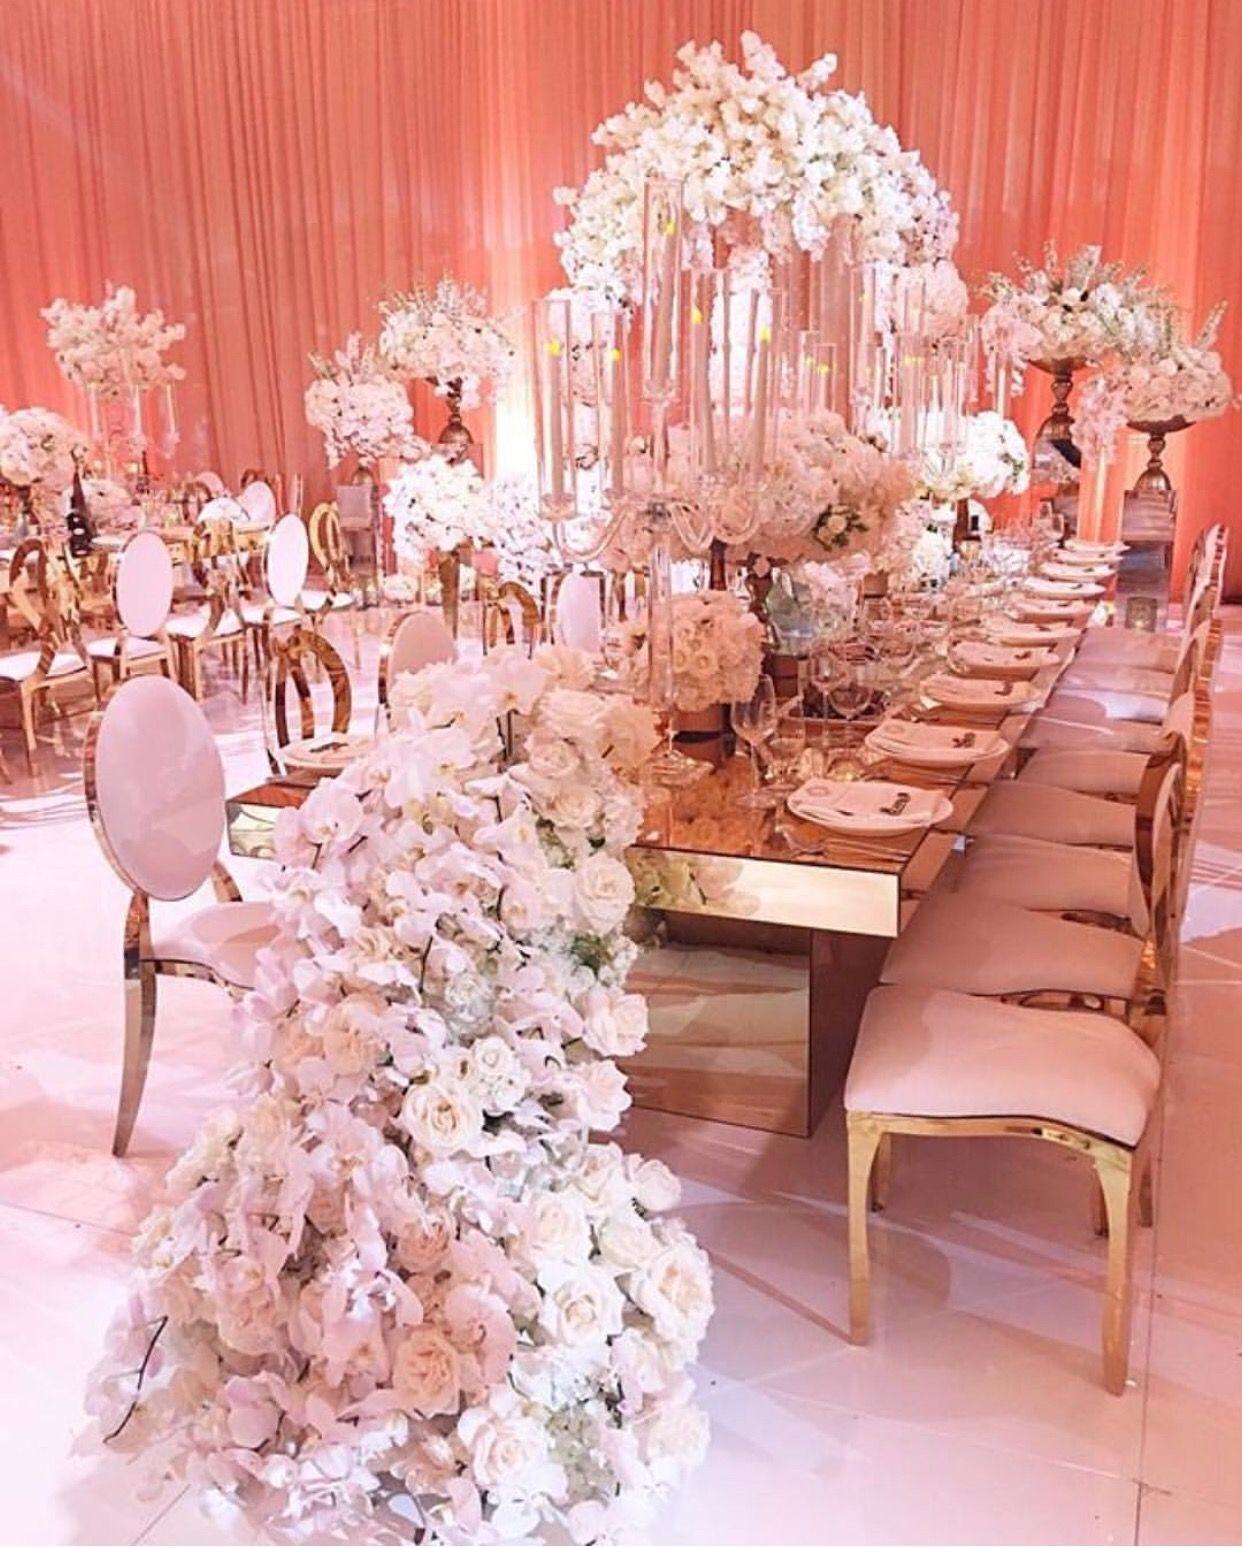 Luxury wedding decoration ideas  backdrop good idea  One day  Pinterest  Event decor Wedding